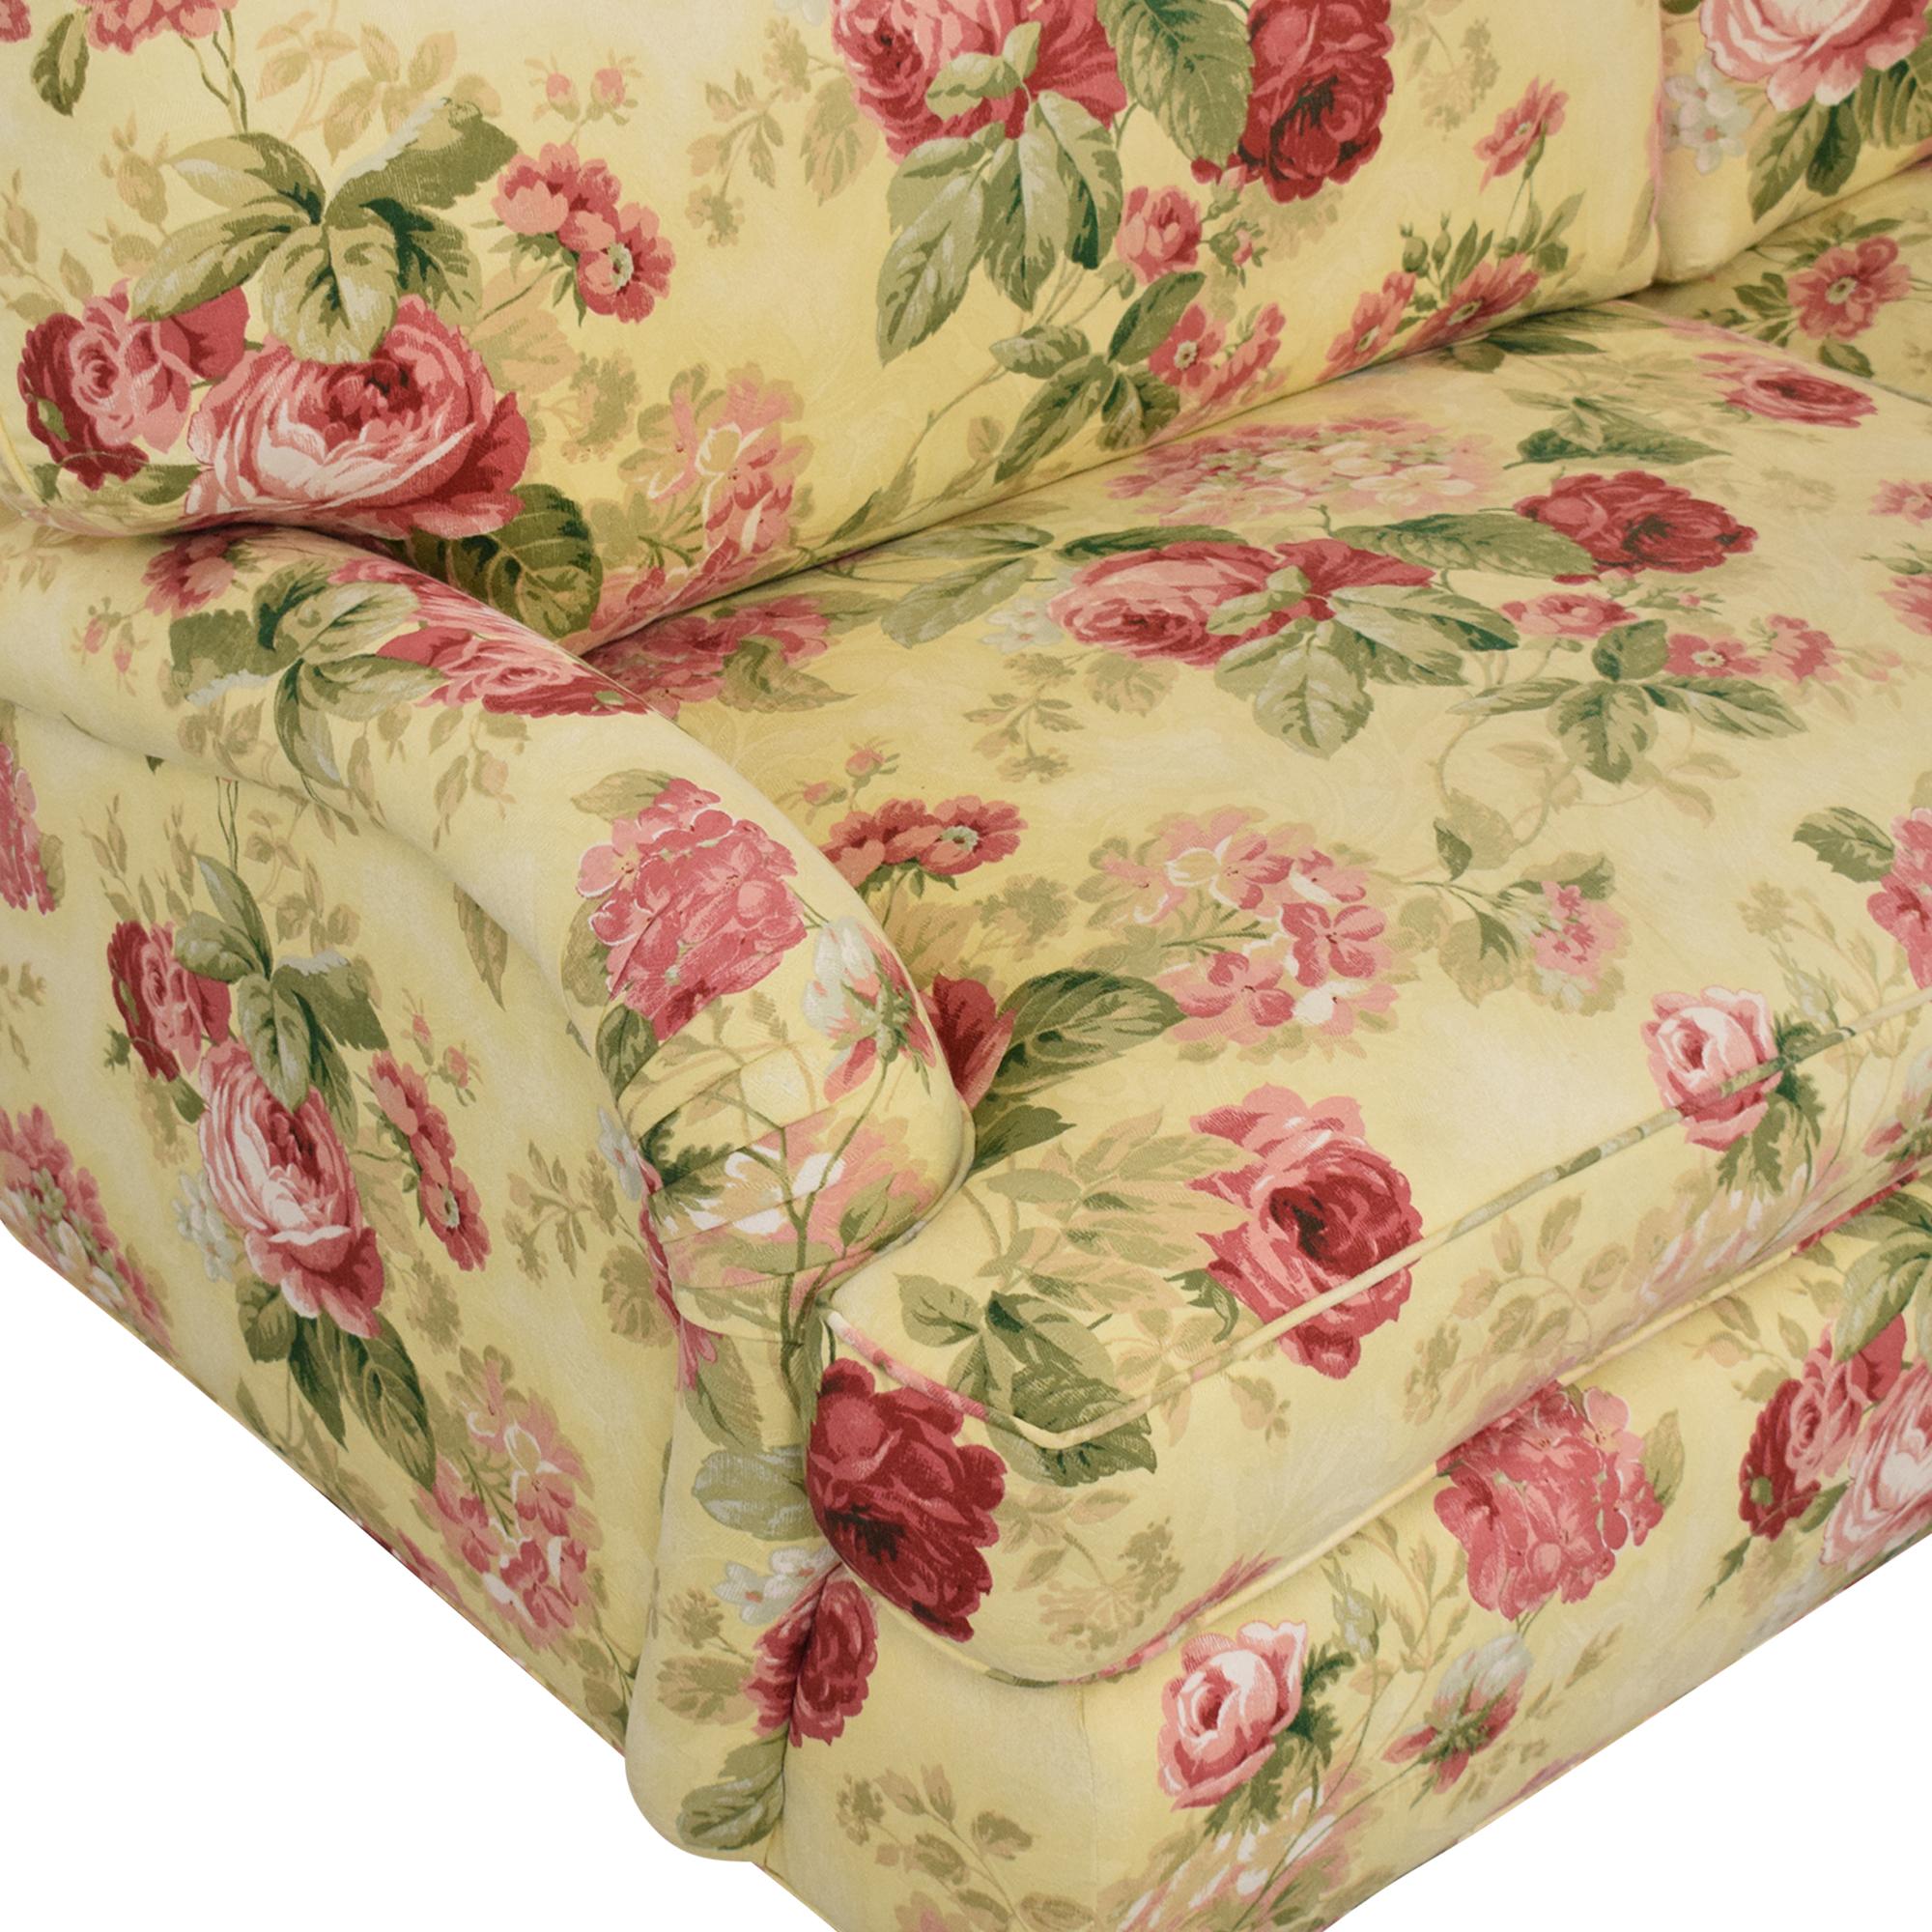 Greenbaum Interiors Greenbaum Two Cushion Sofa dimensions